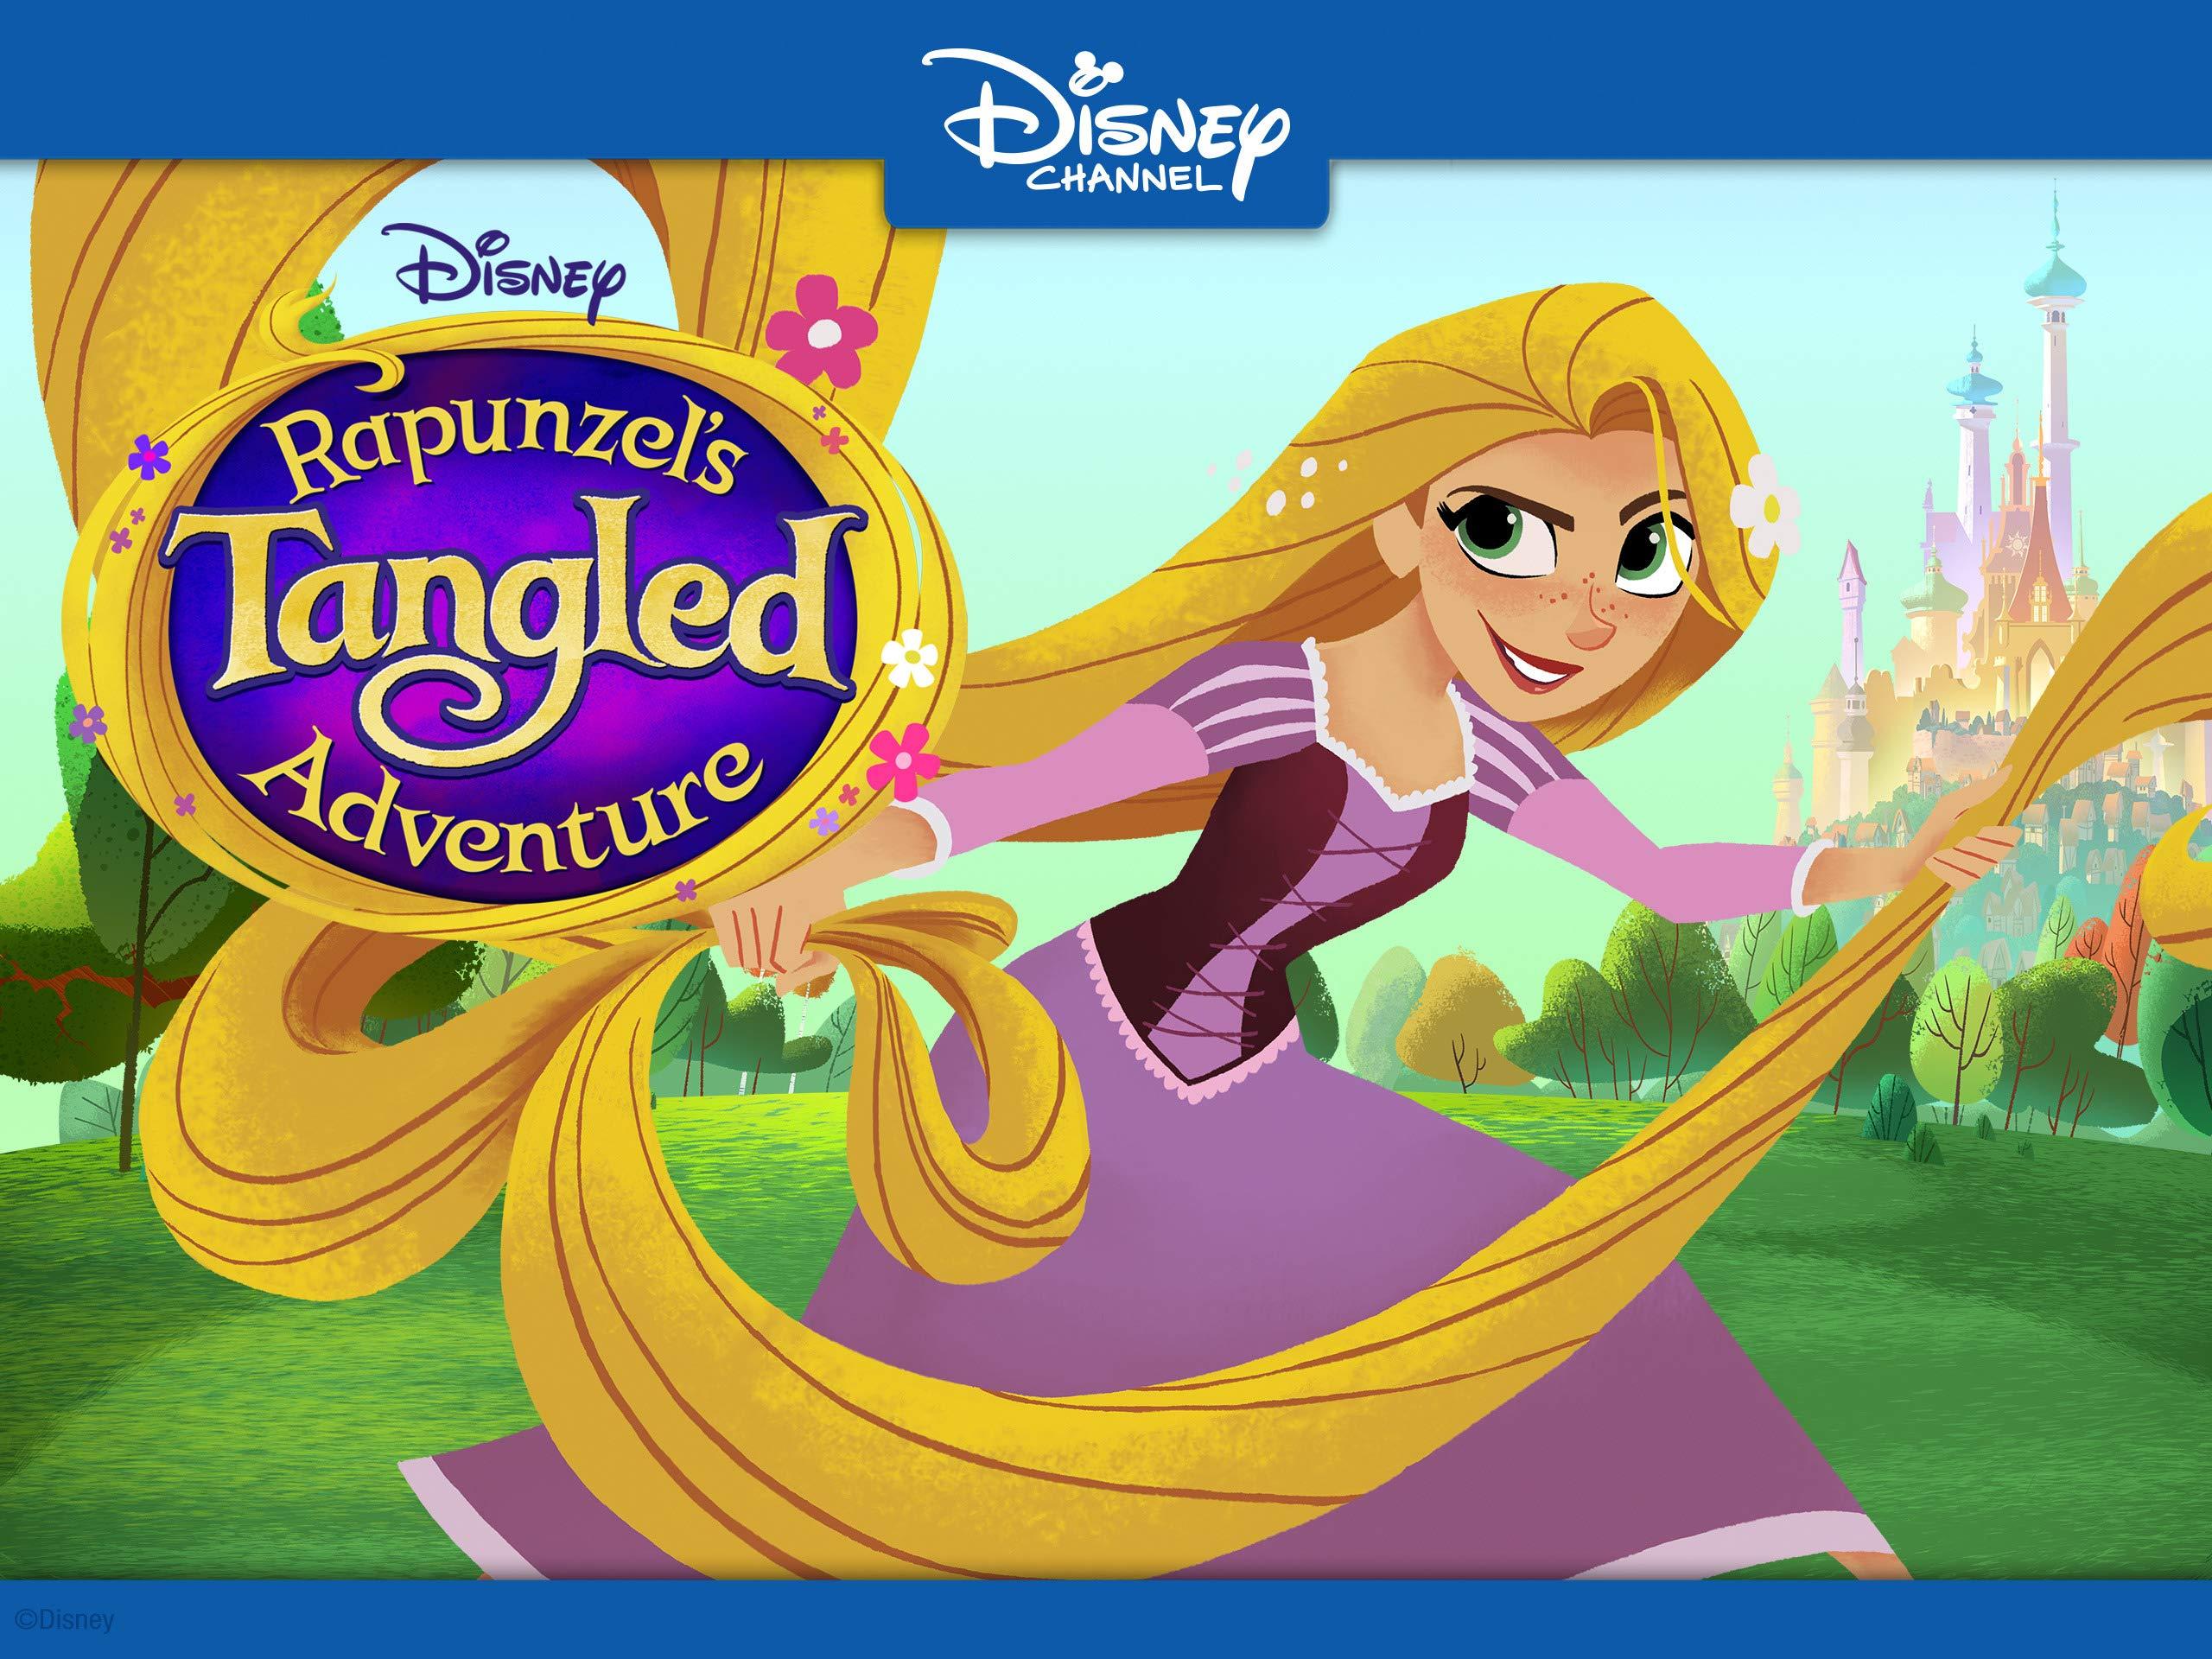 Rapunzel Tangled Adventure